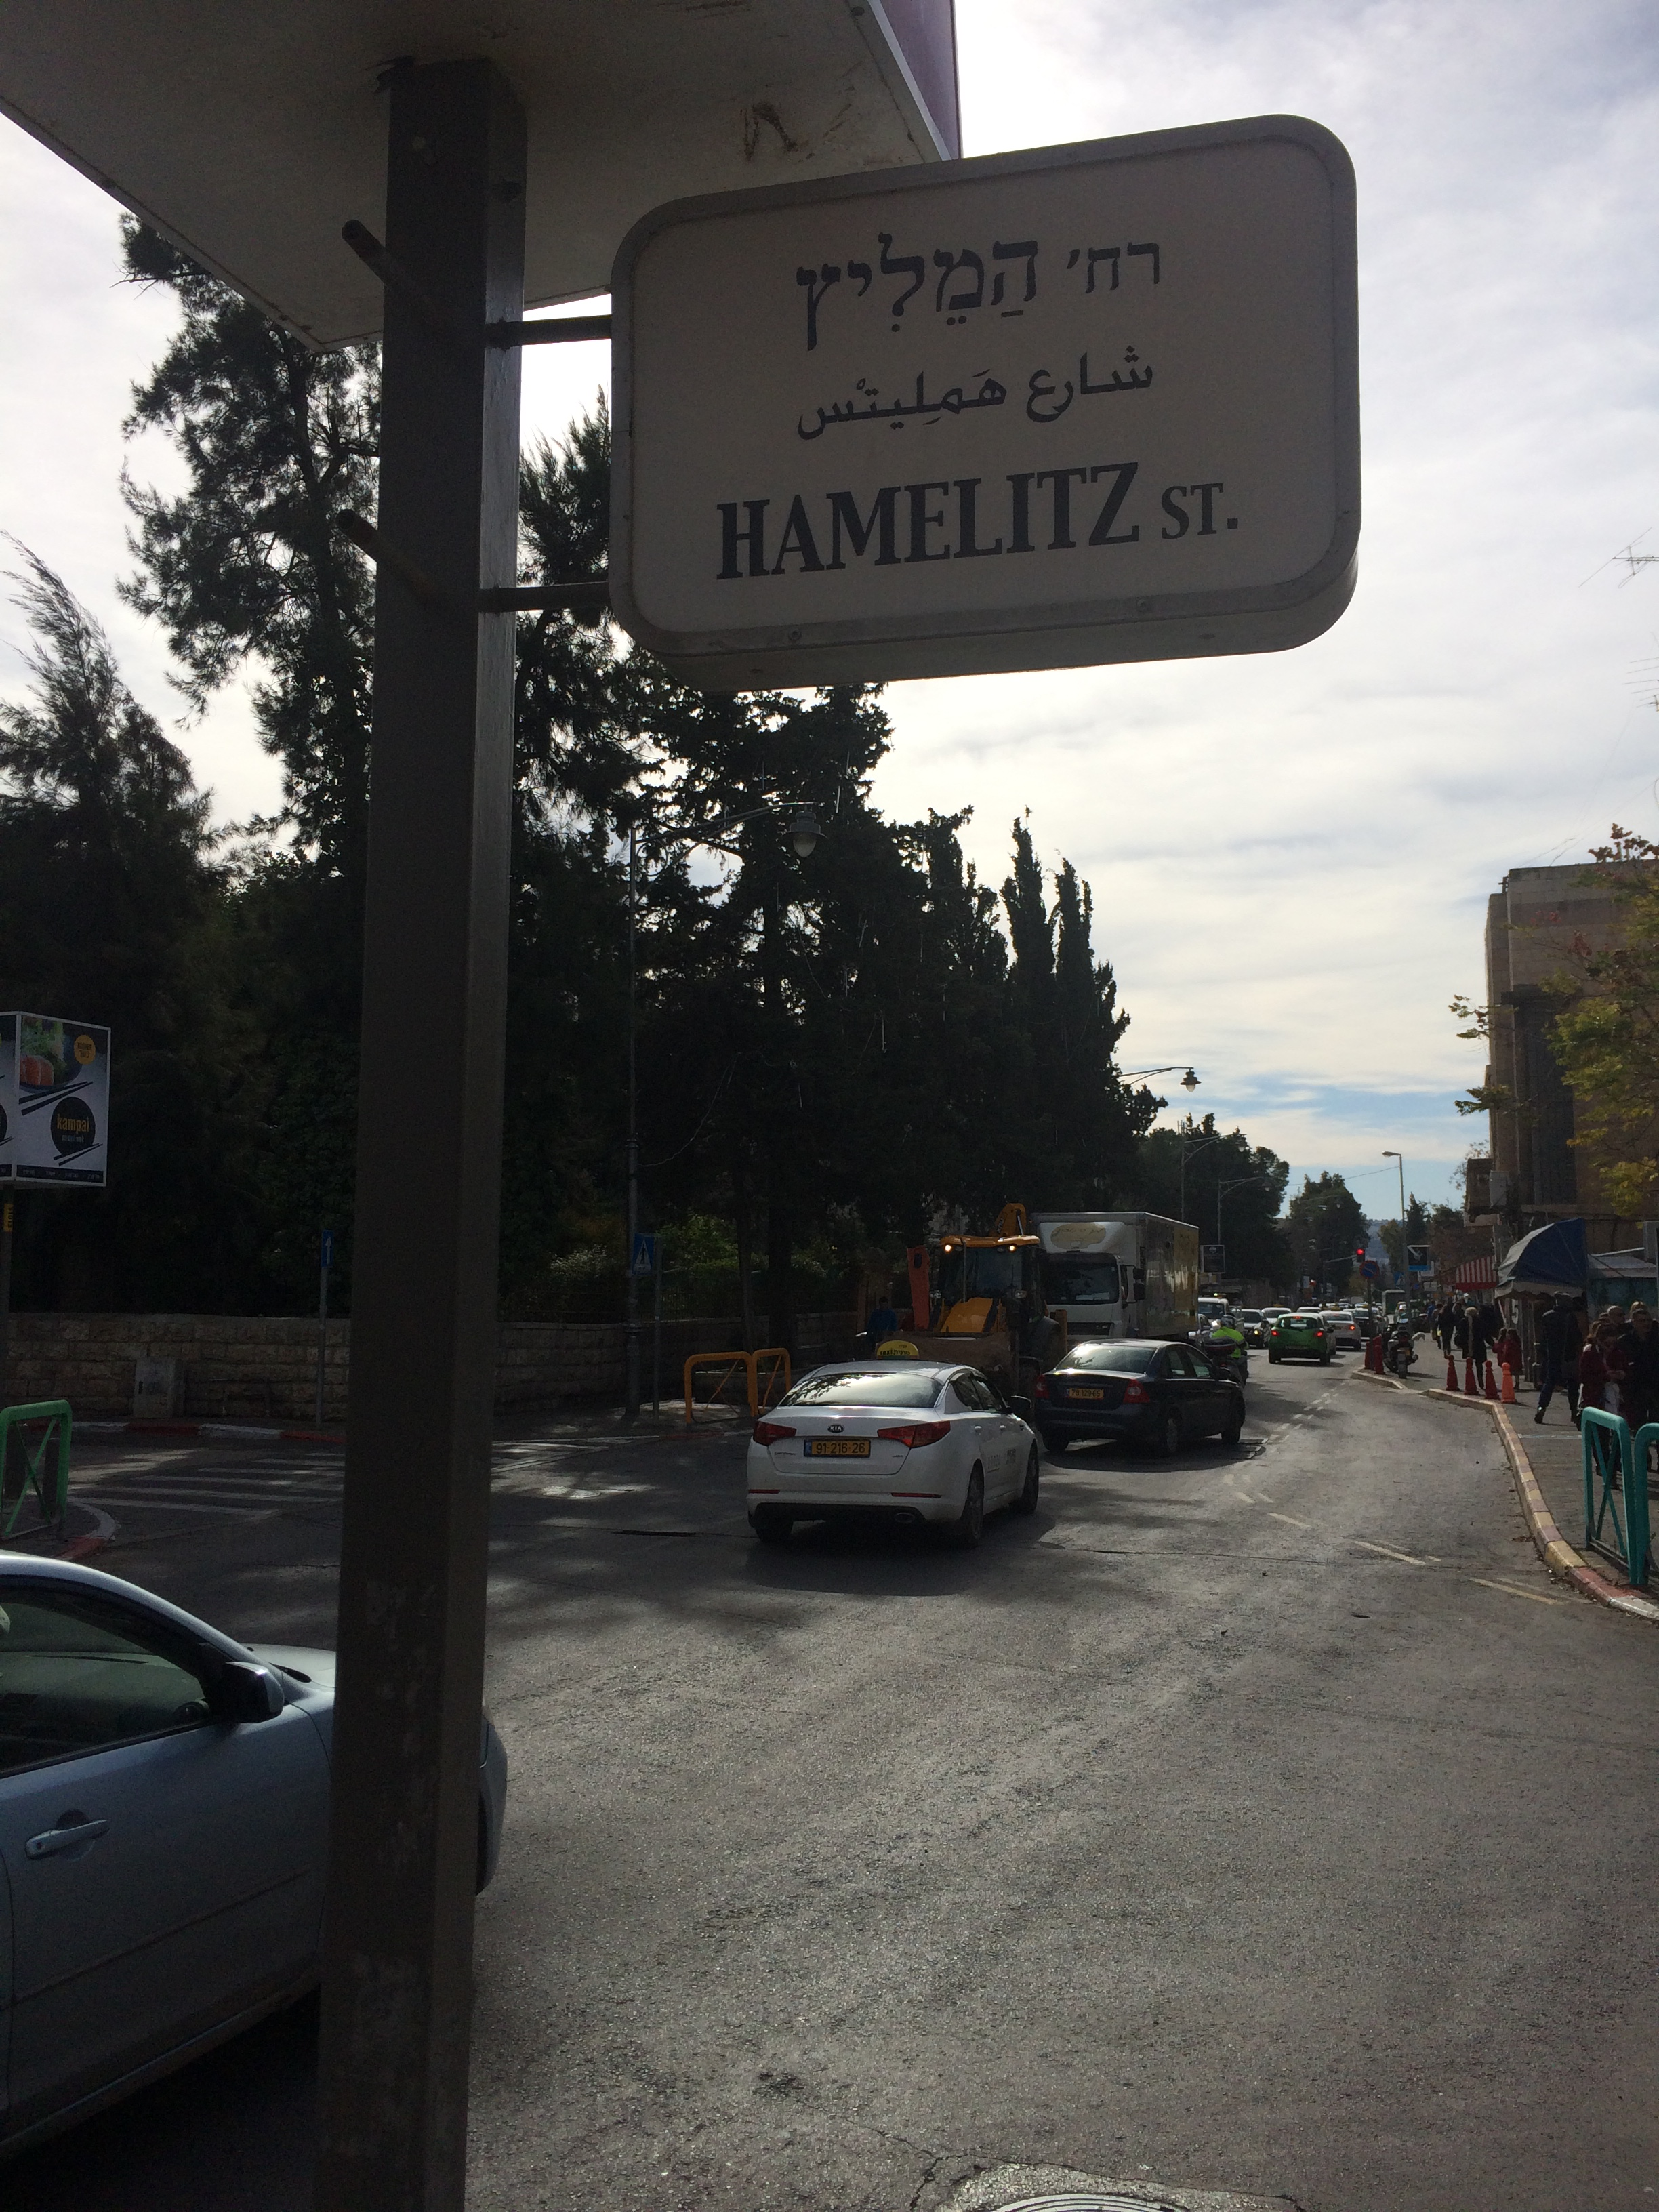 Jutzot Ierushalaim – XXII – Las calles de Jerusalém: HaMelitz